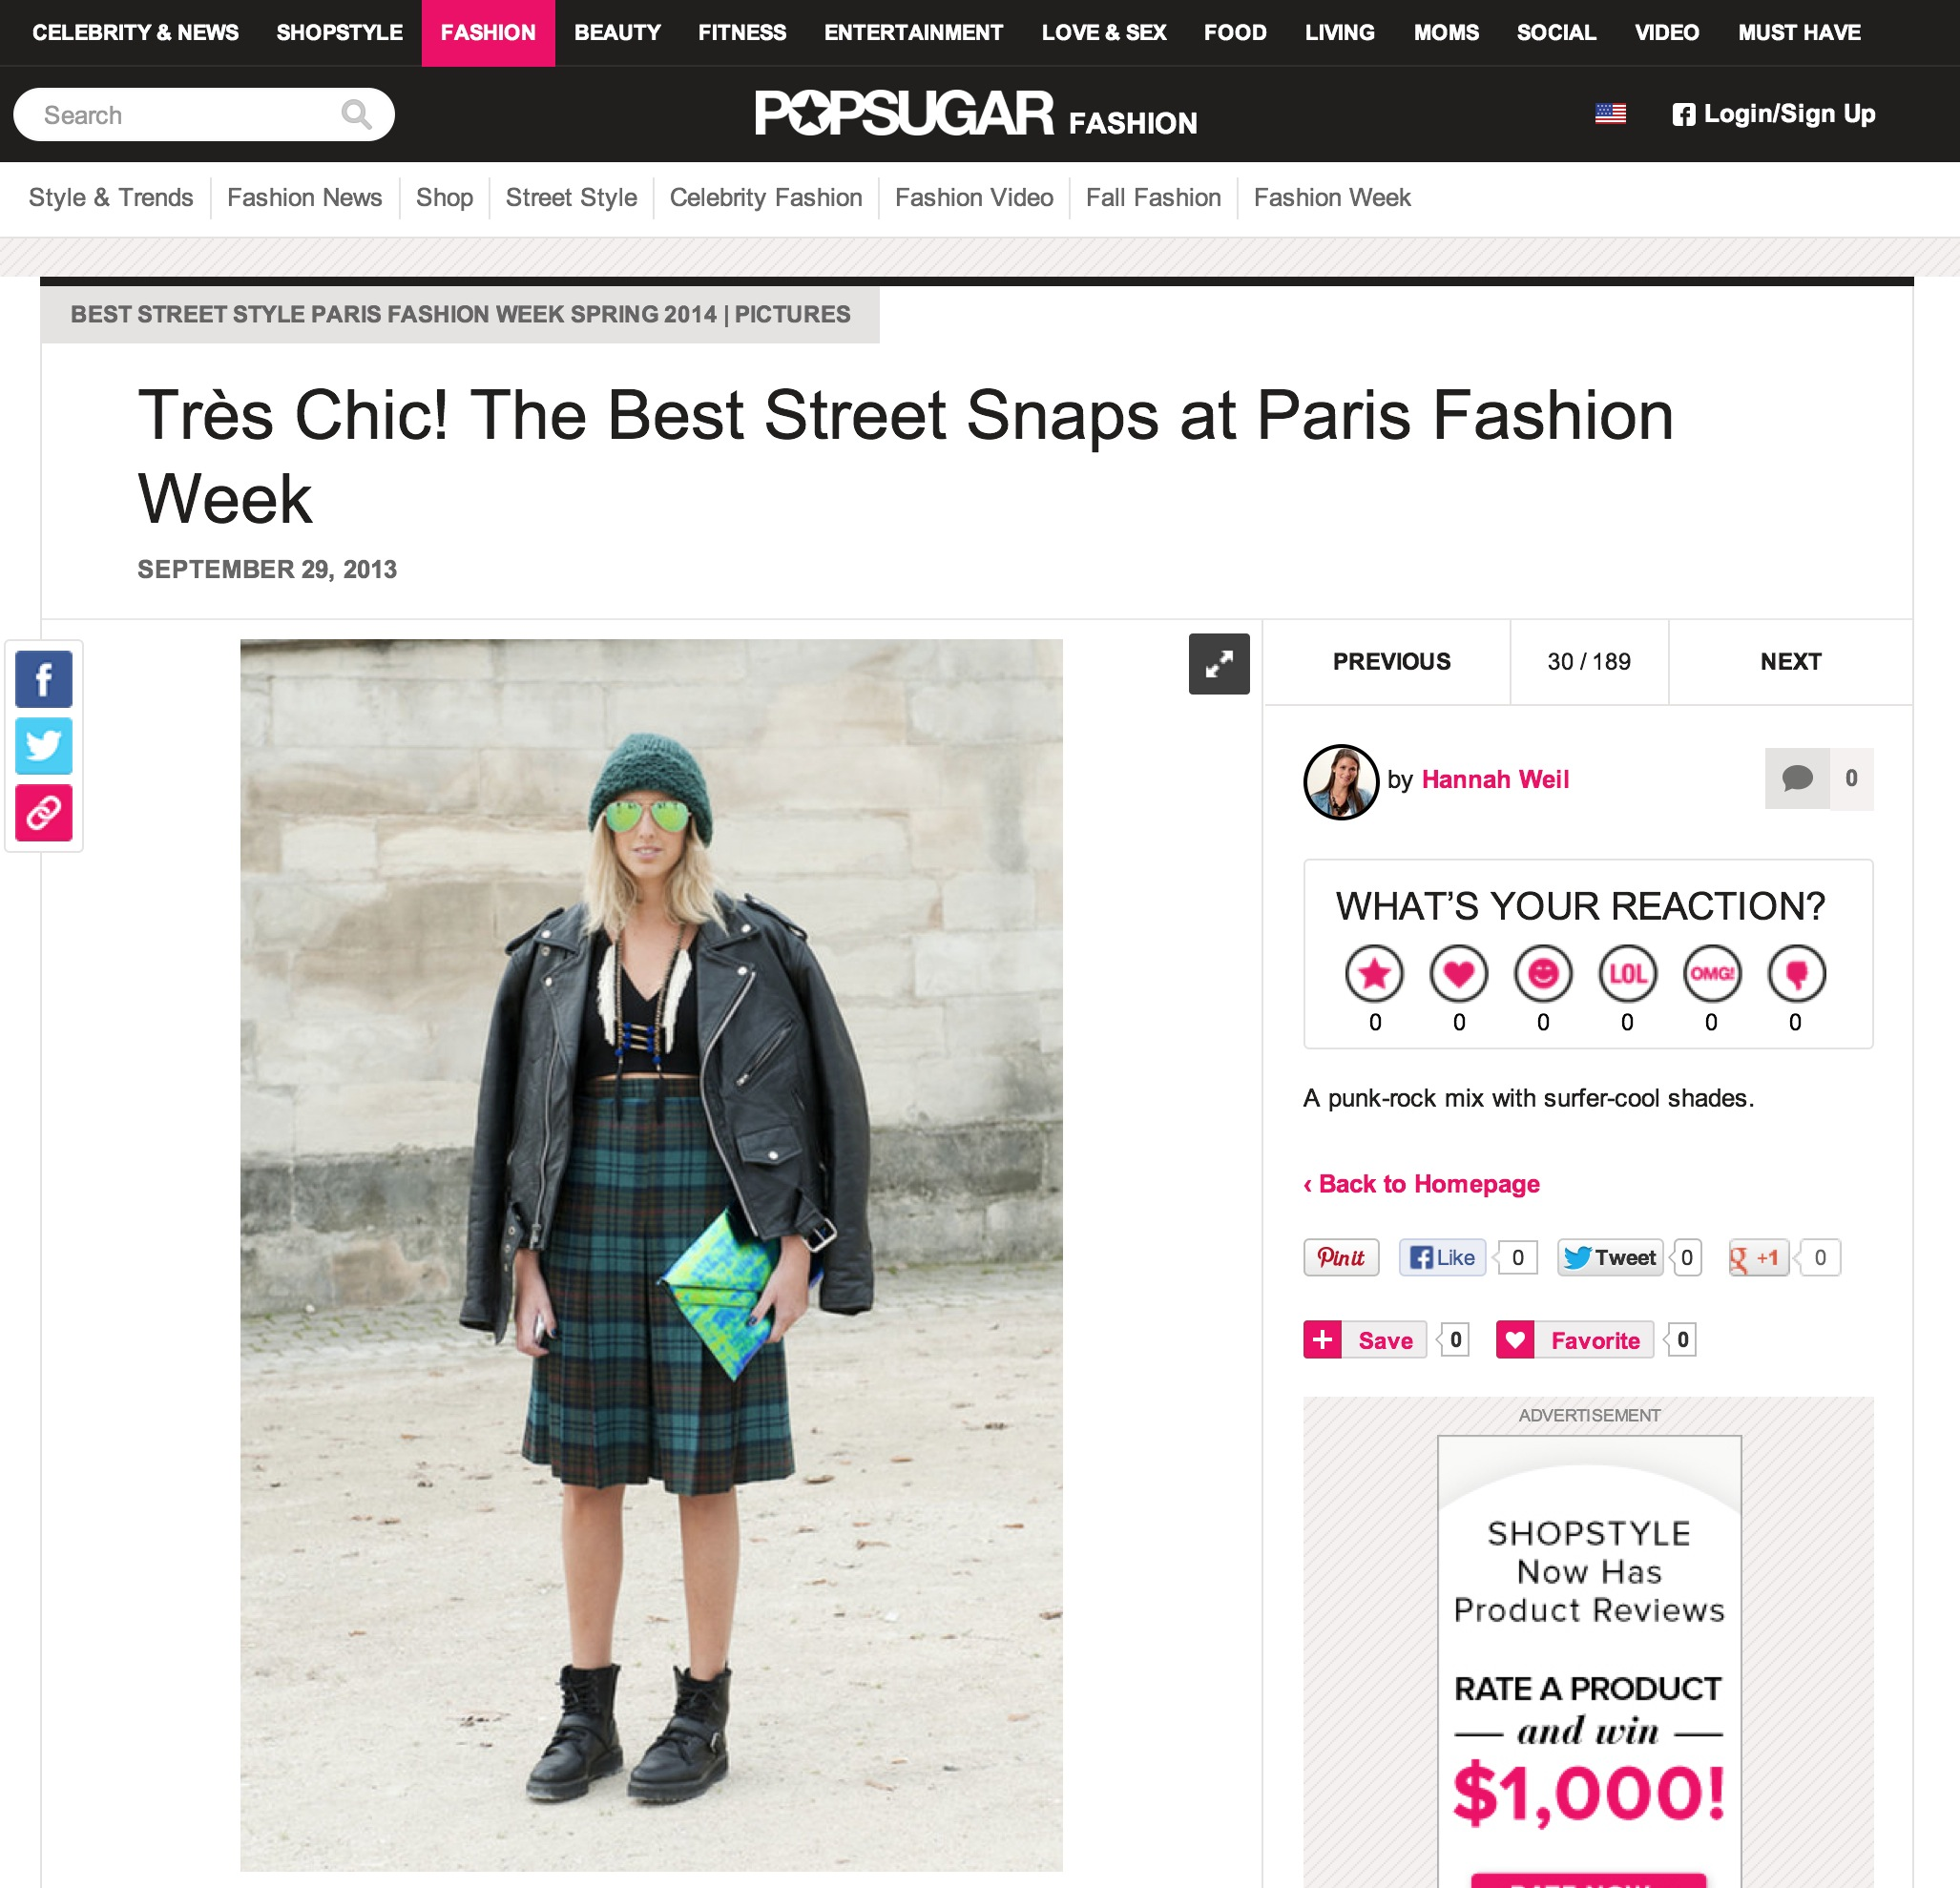 popsugar fashion   Paris fashion week   September 2013